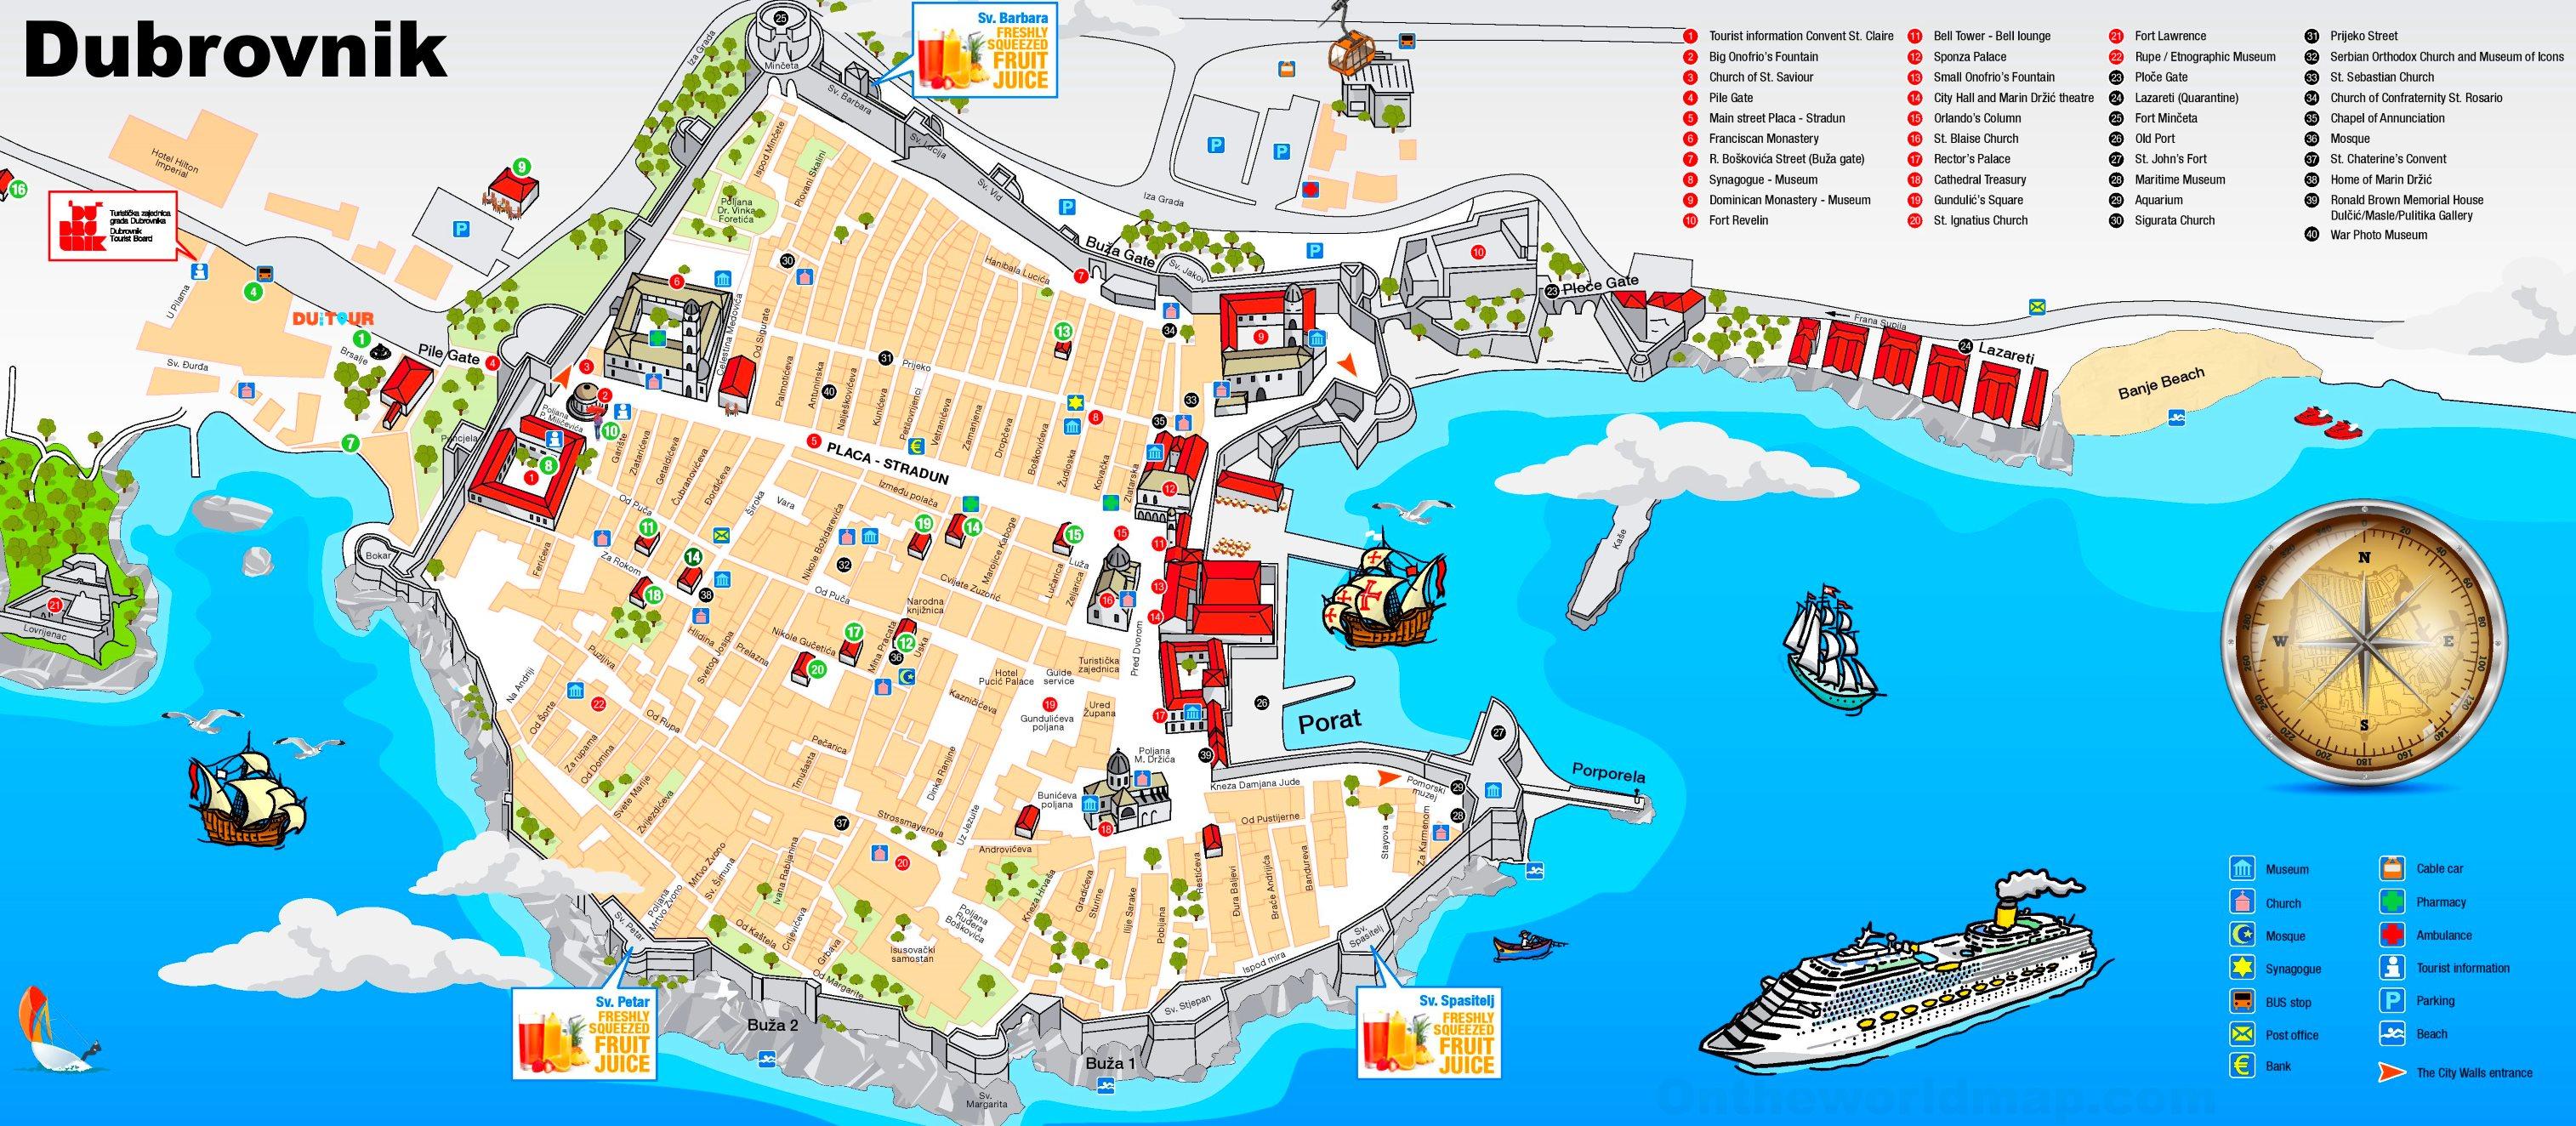 dubrovnik-tourist-map.jpg